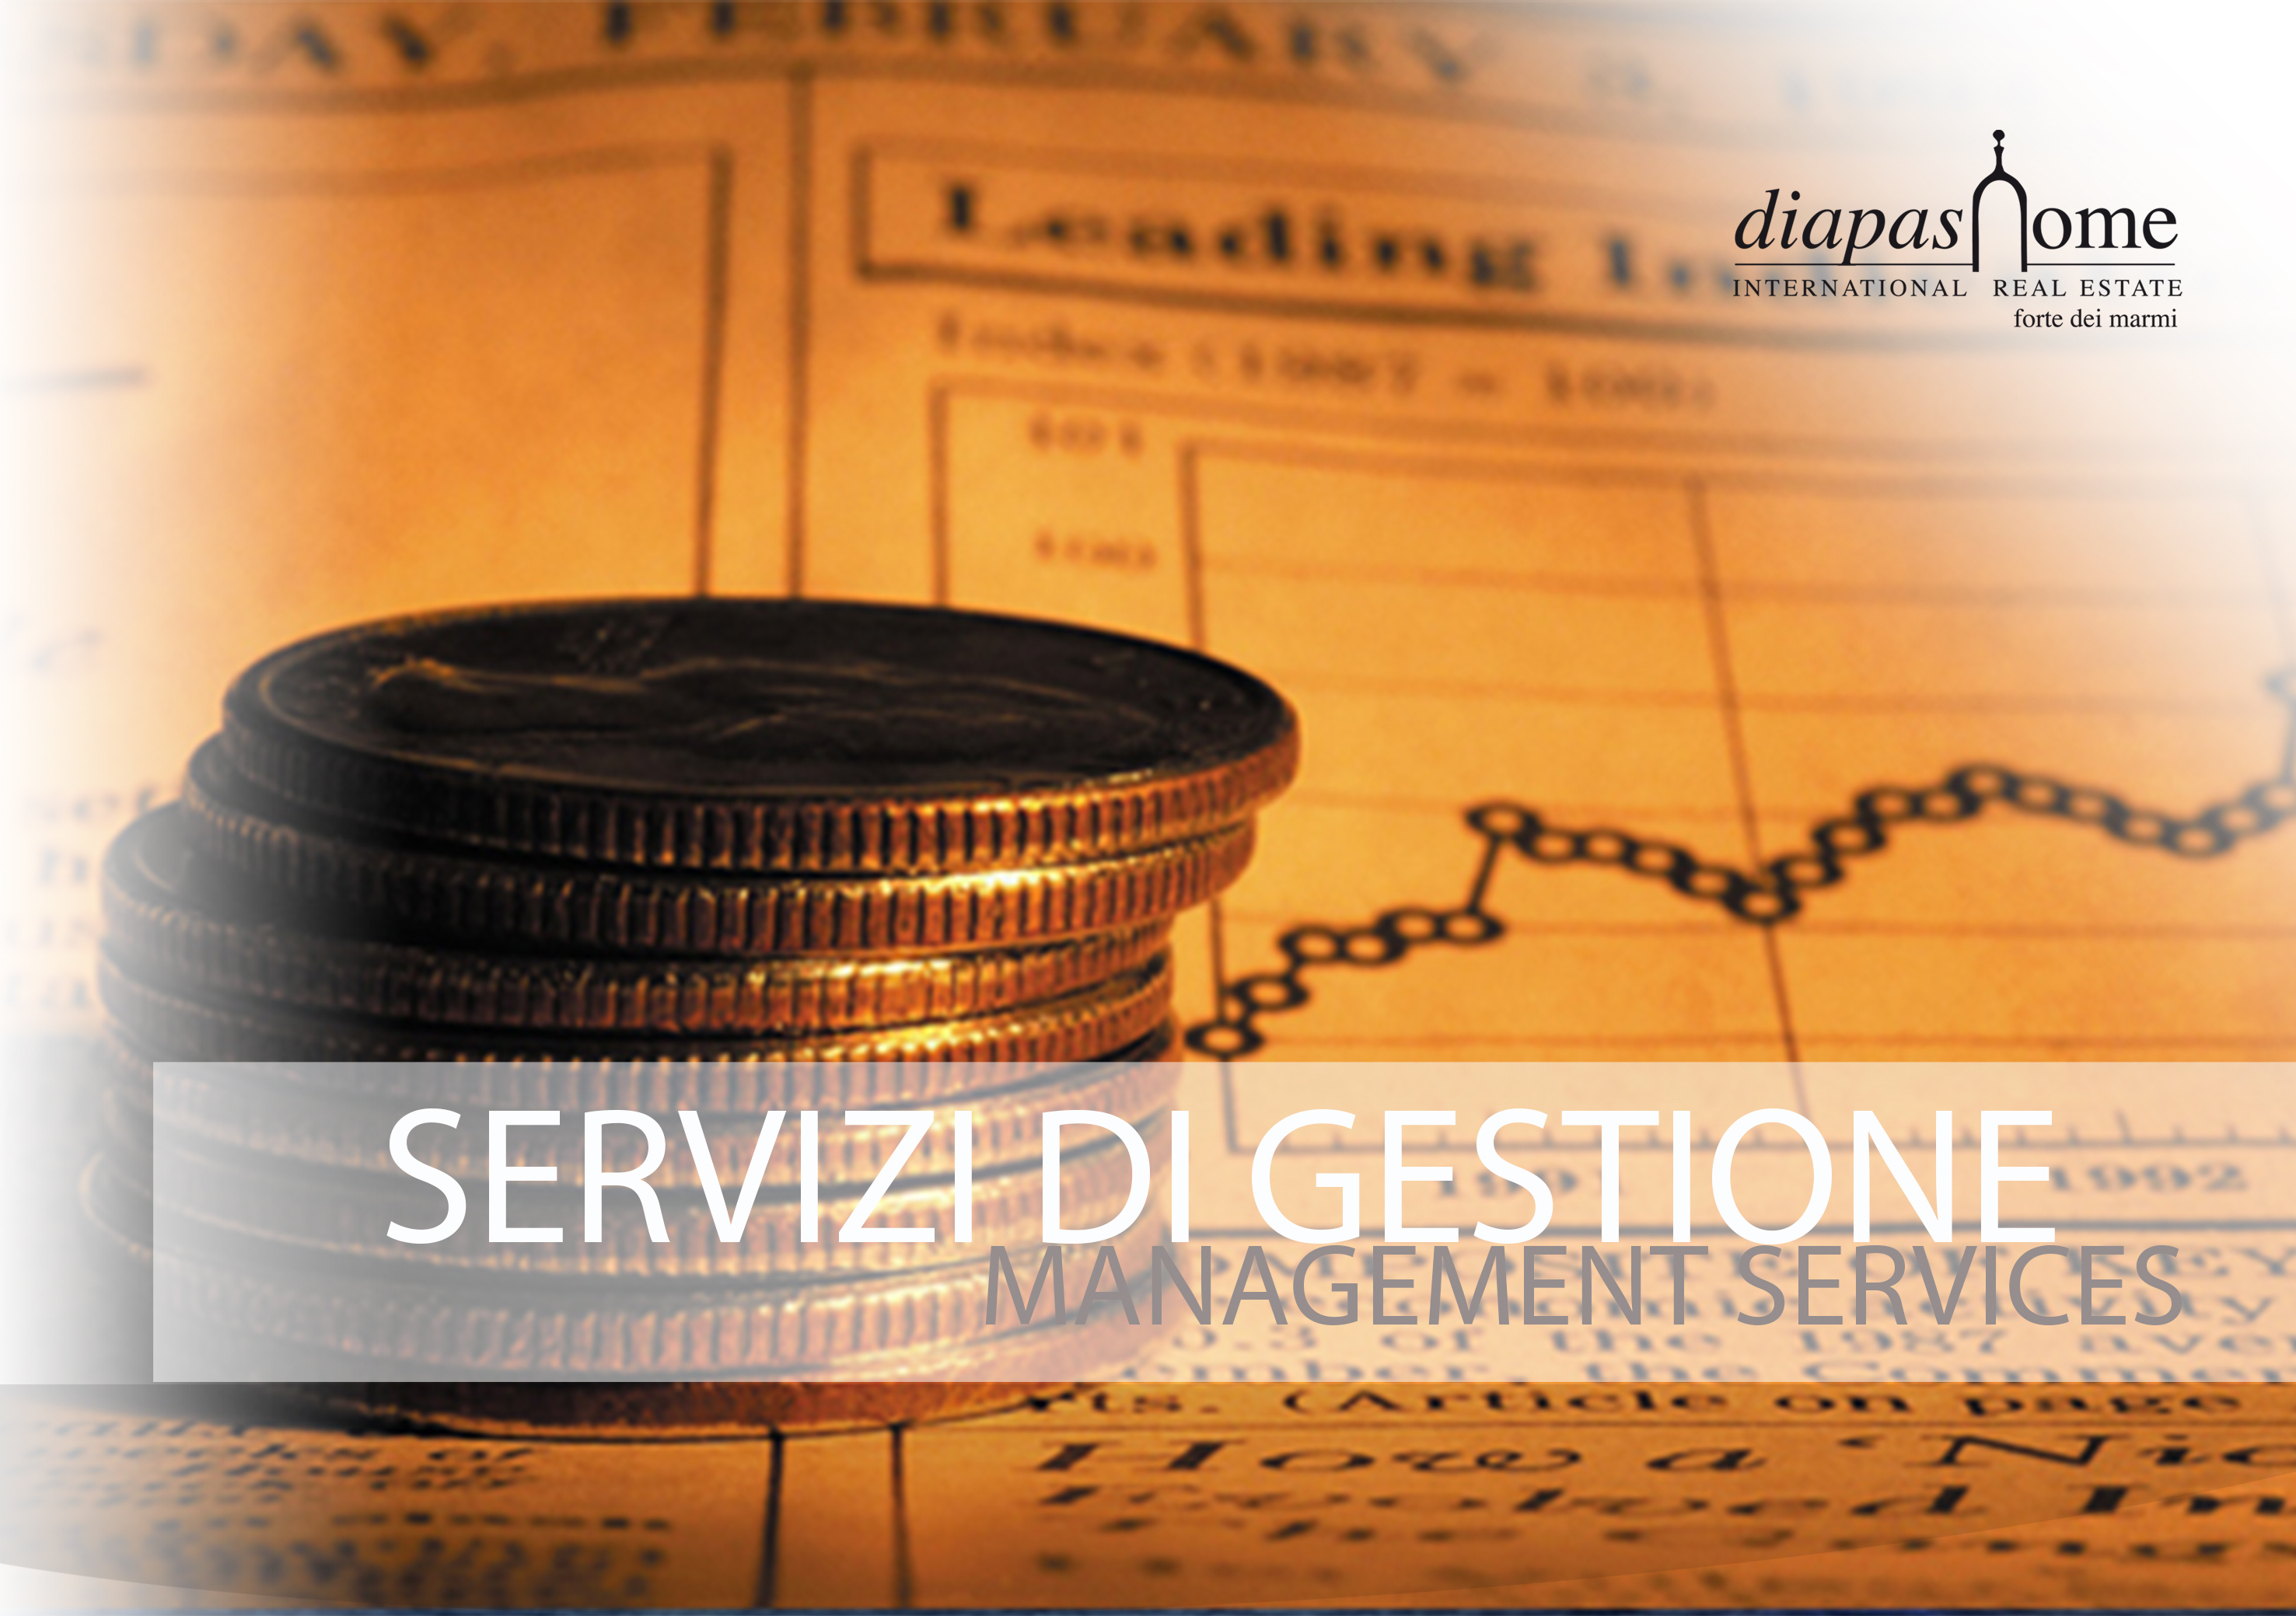 servizi gestione